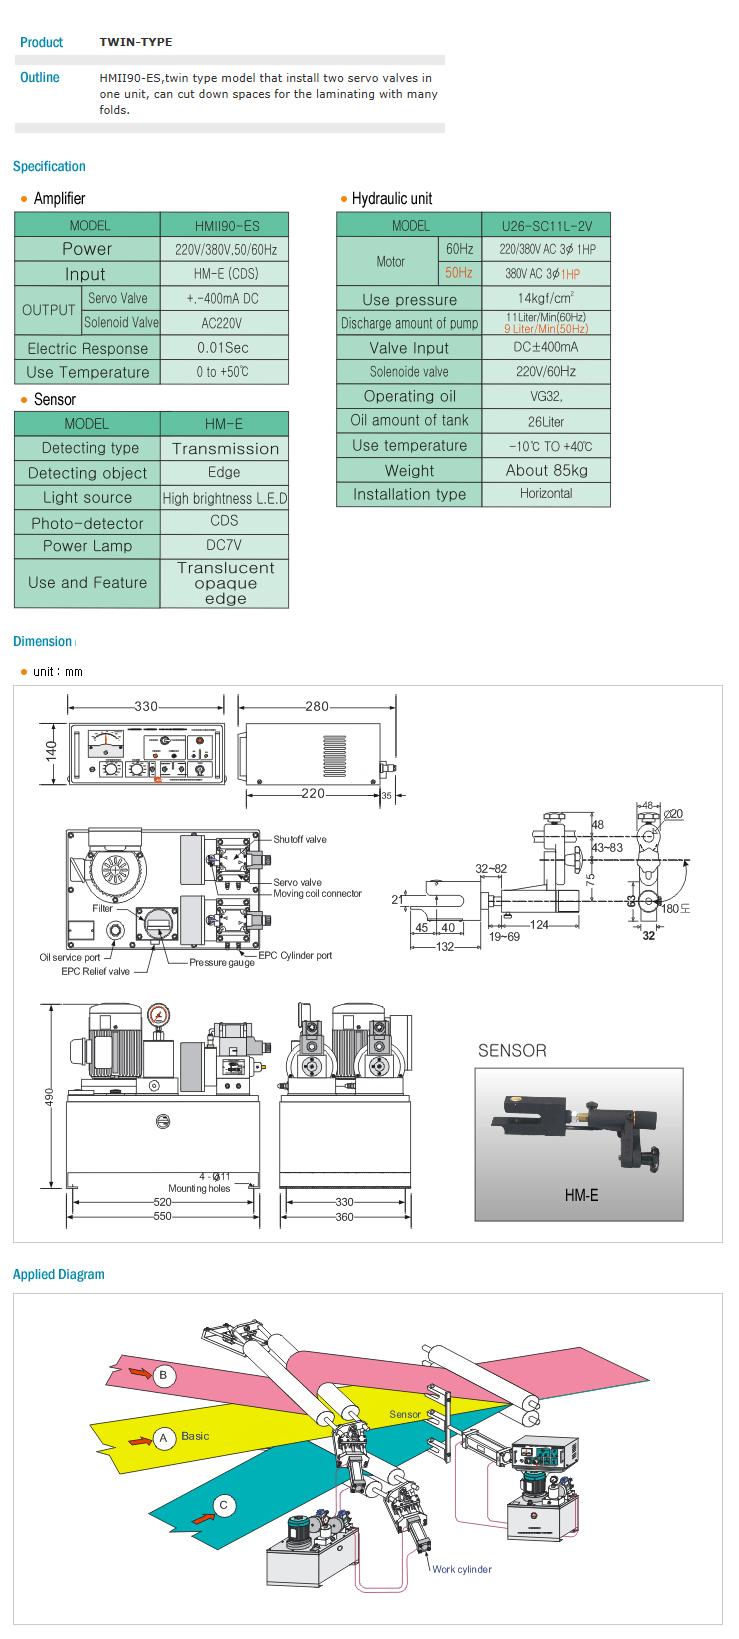 HANMI ELECTRONICS Hydraulic TWIN-TYPE